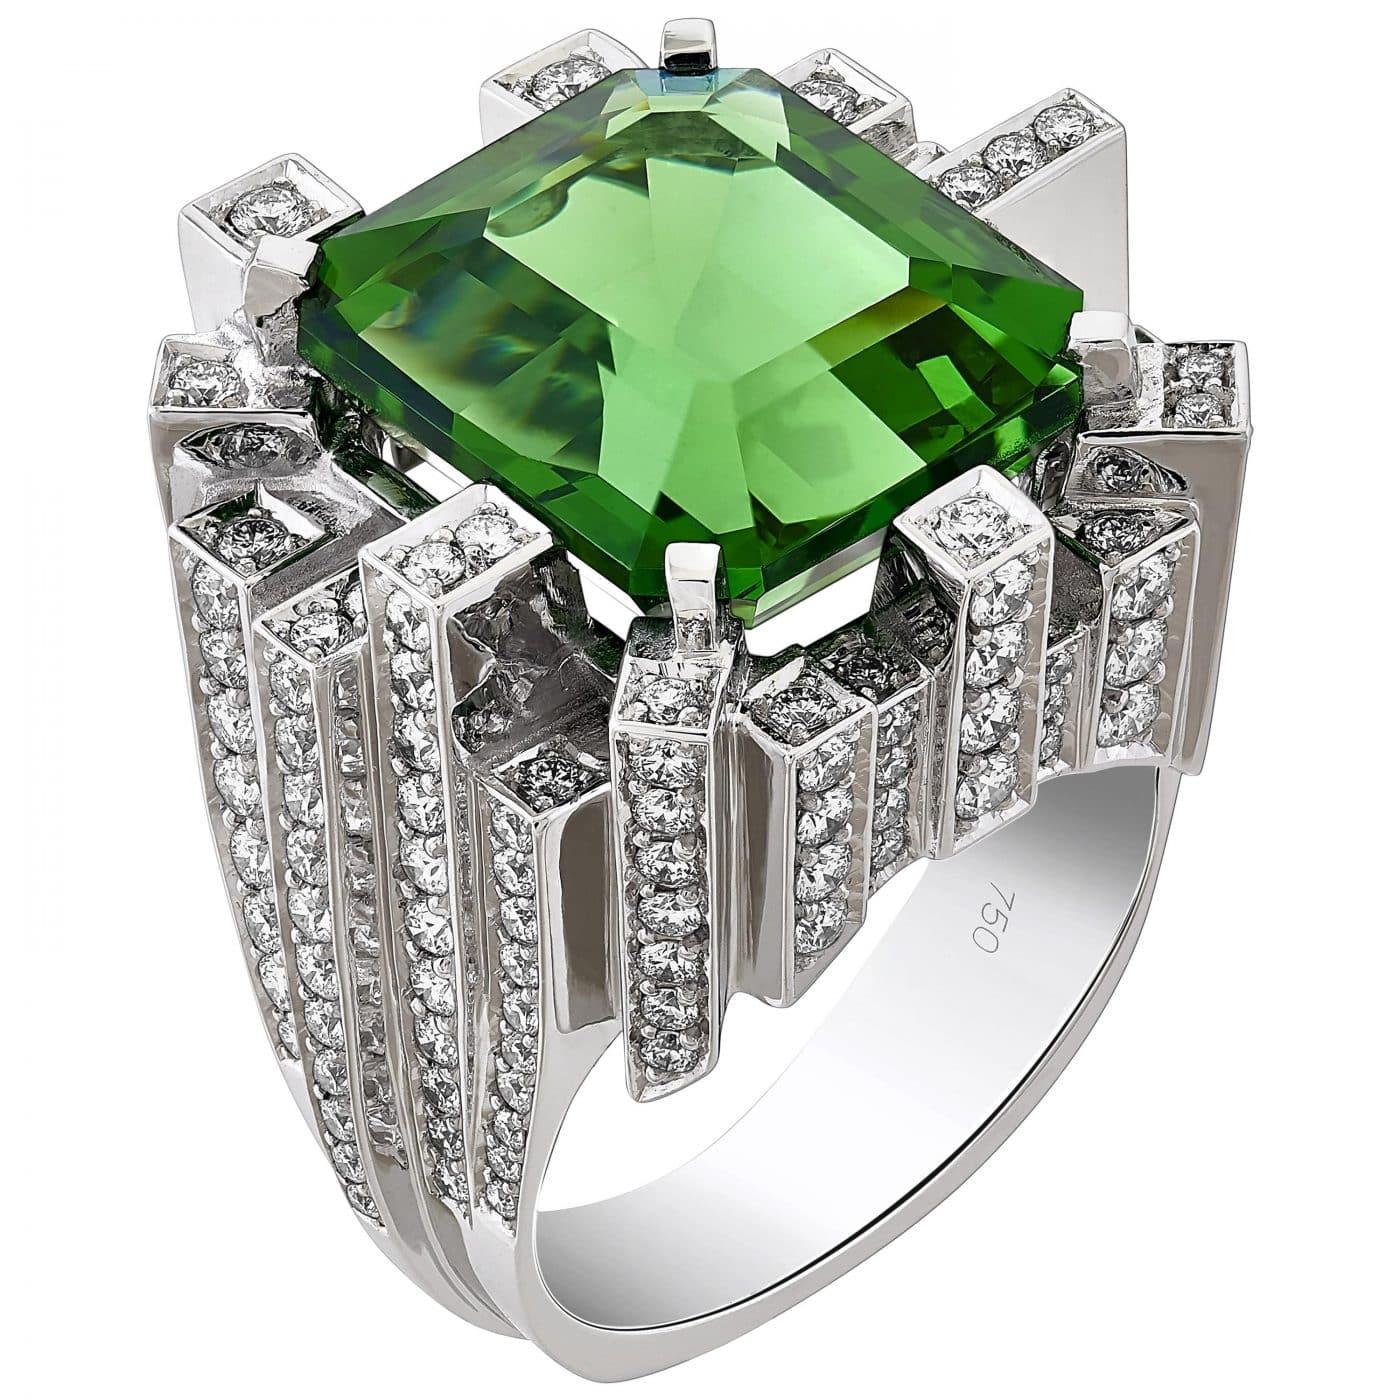 Moldavite Cocktail Ring with Diamonds in 18 Karat Gold